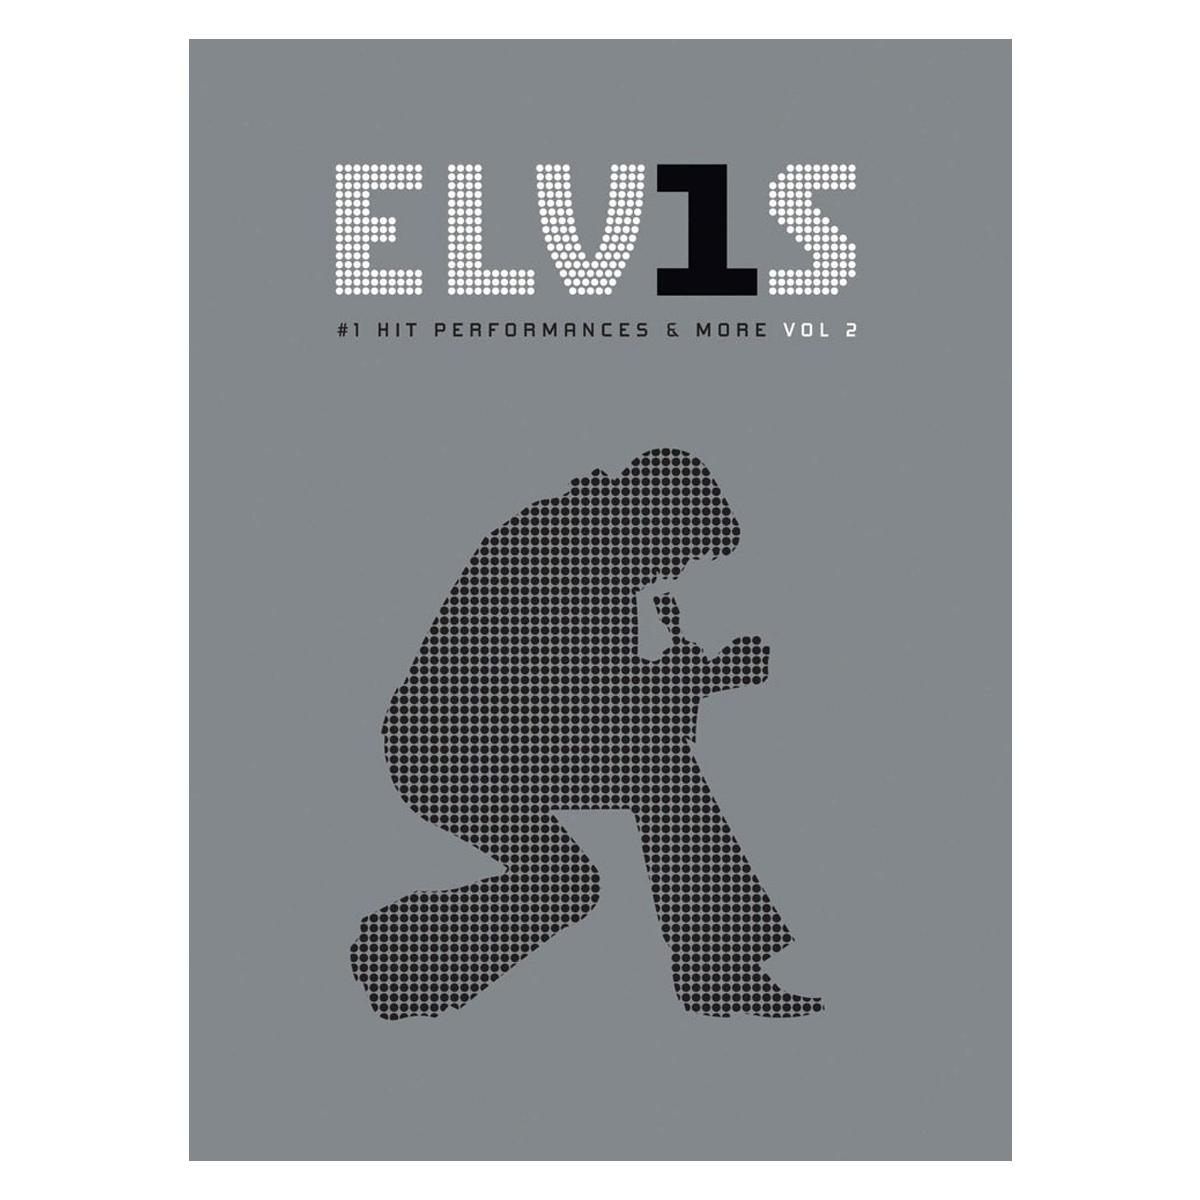 DVD Elvis - #1 Hit Performances And More Vol 2